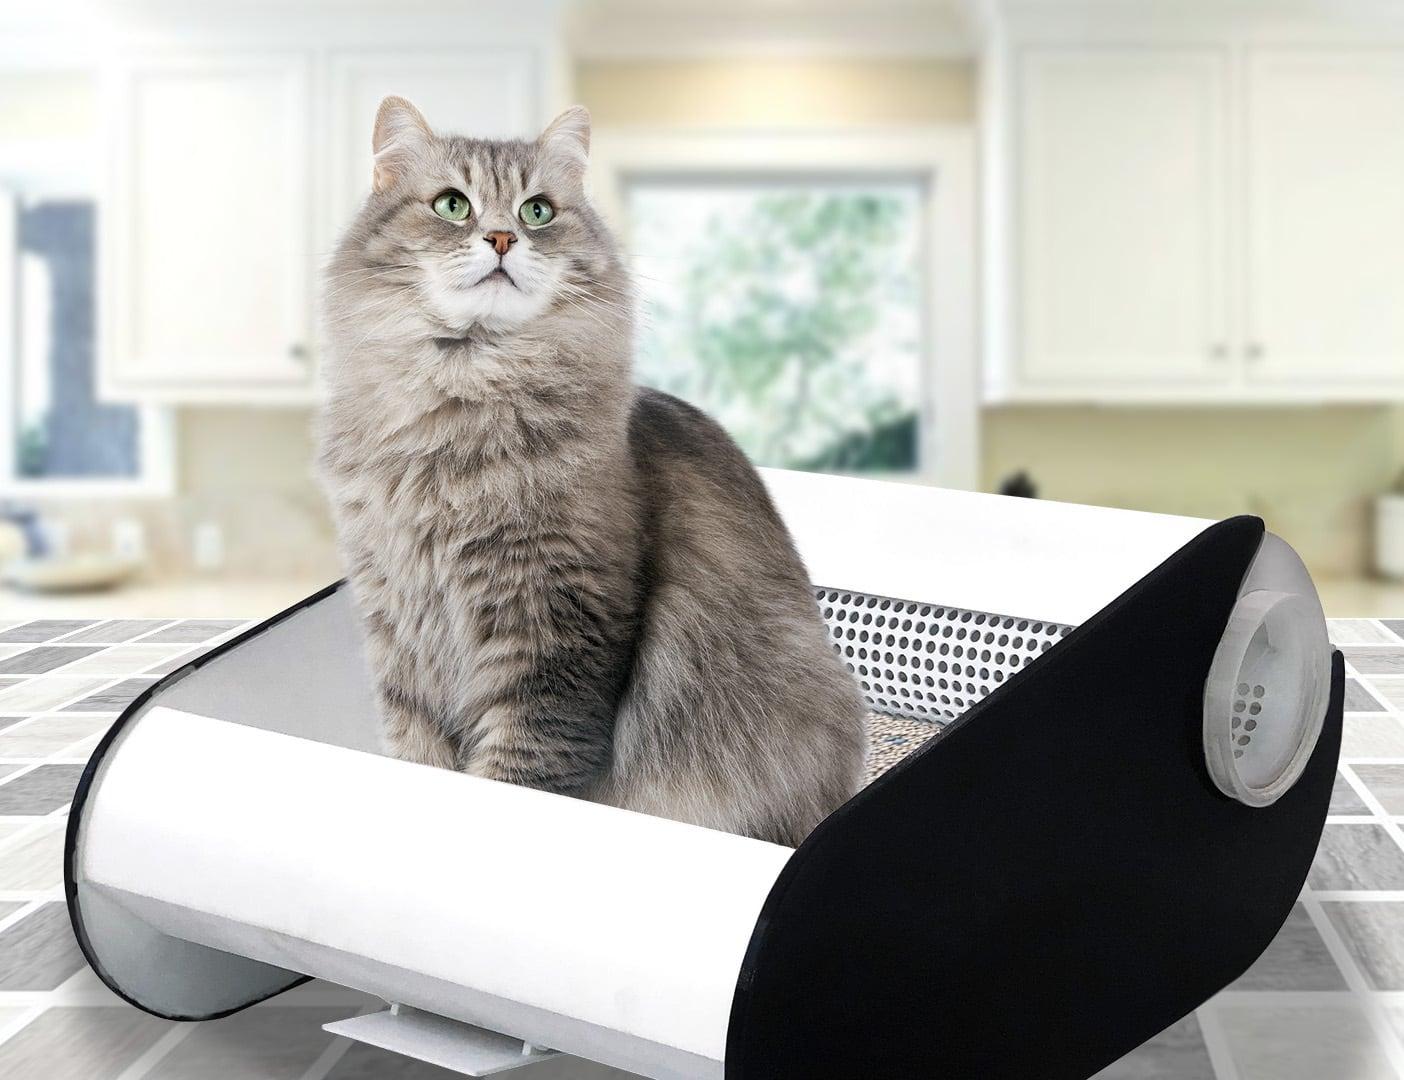 VolKat Hygienic Cat Litter Box